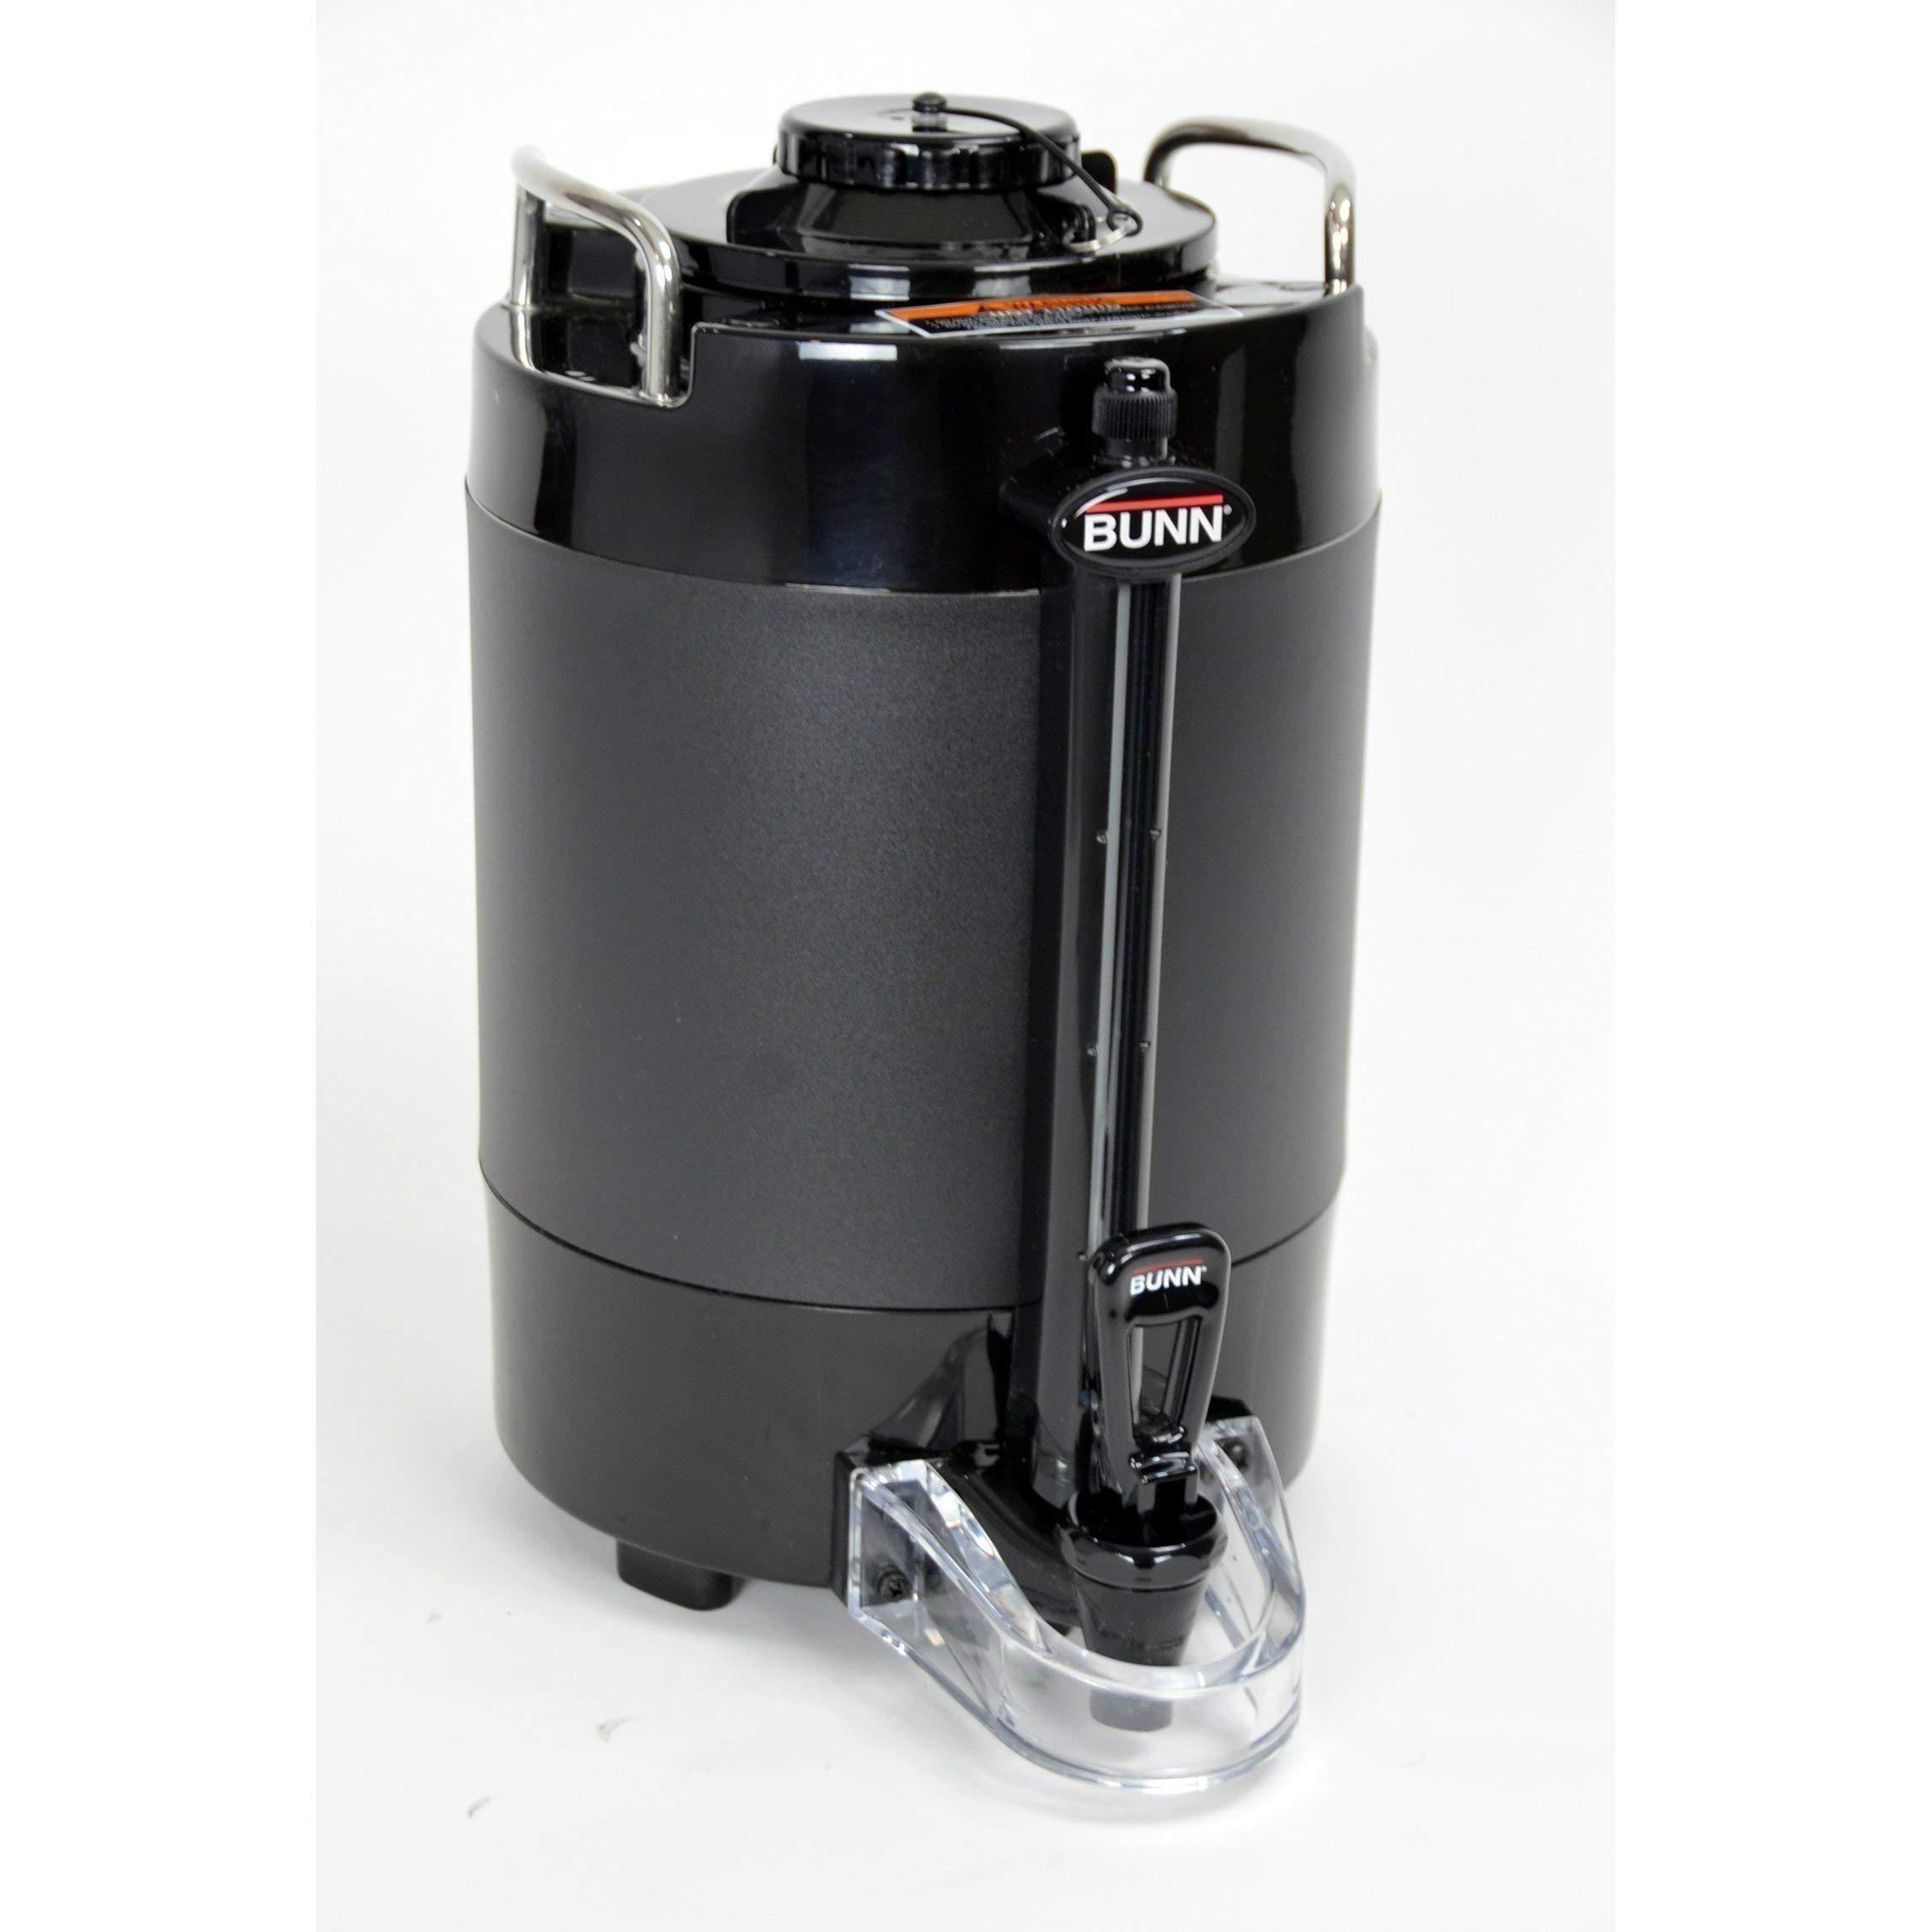 Bunn 44050.0051 TF 1.5 Gal Black ThermoFresh Coffee Server Dispenser New Open Box